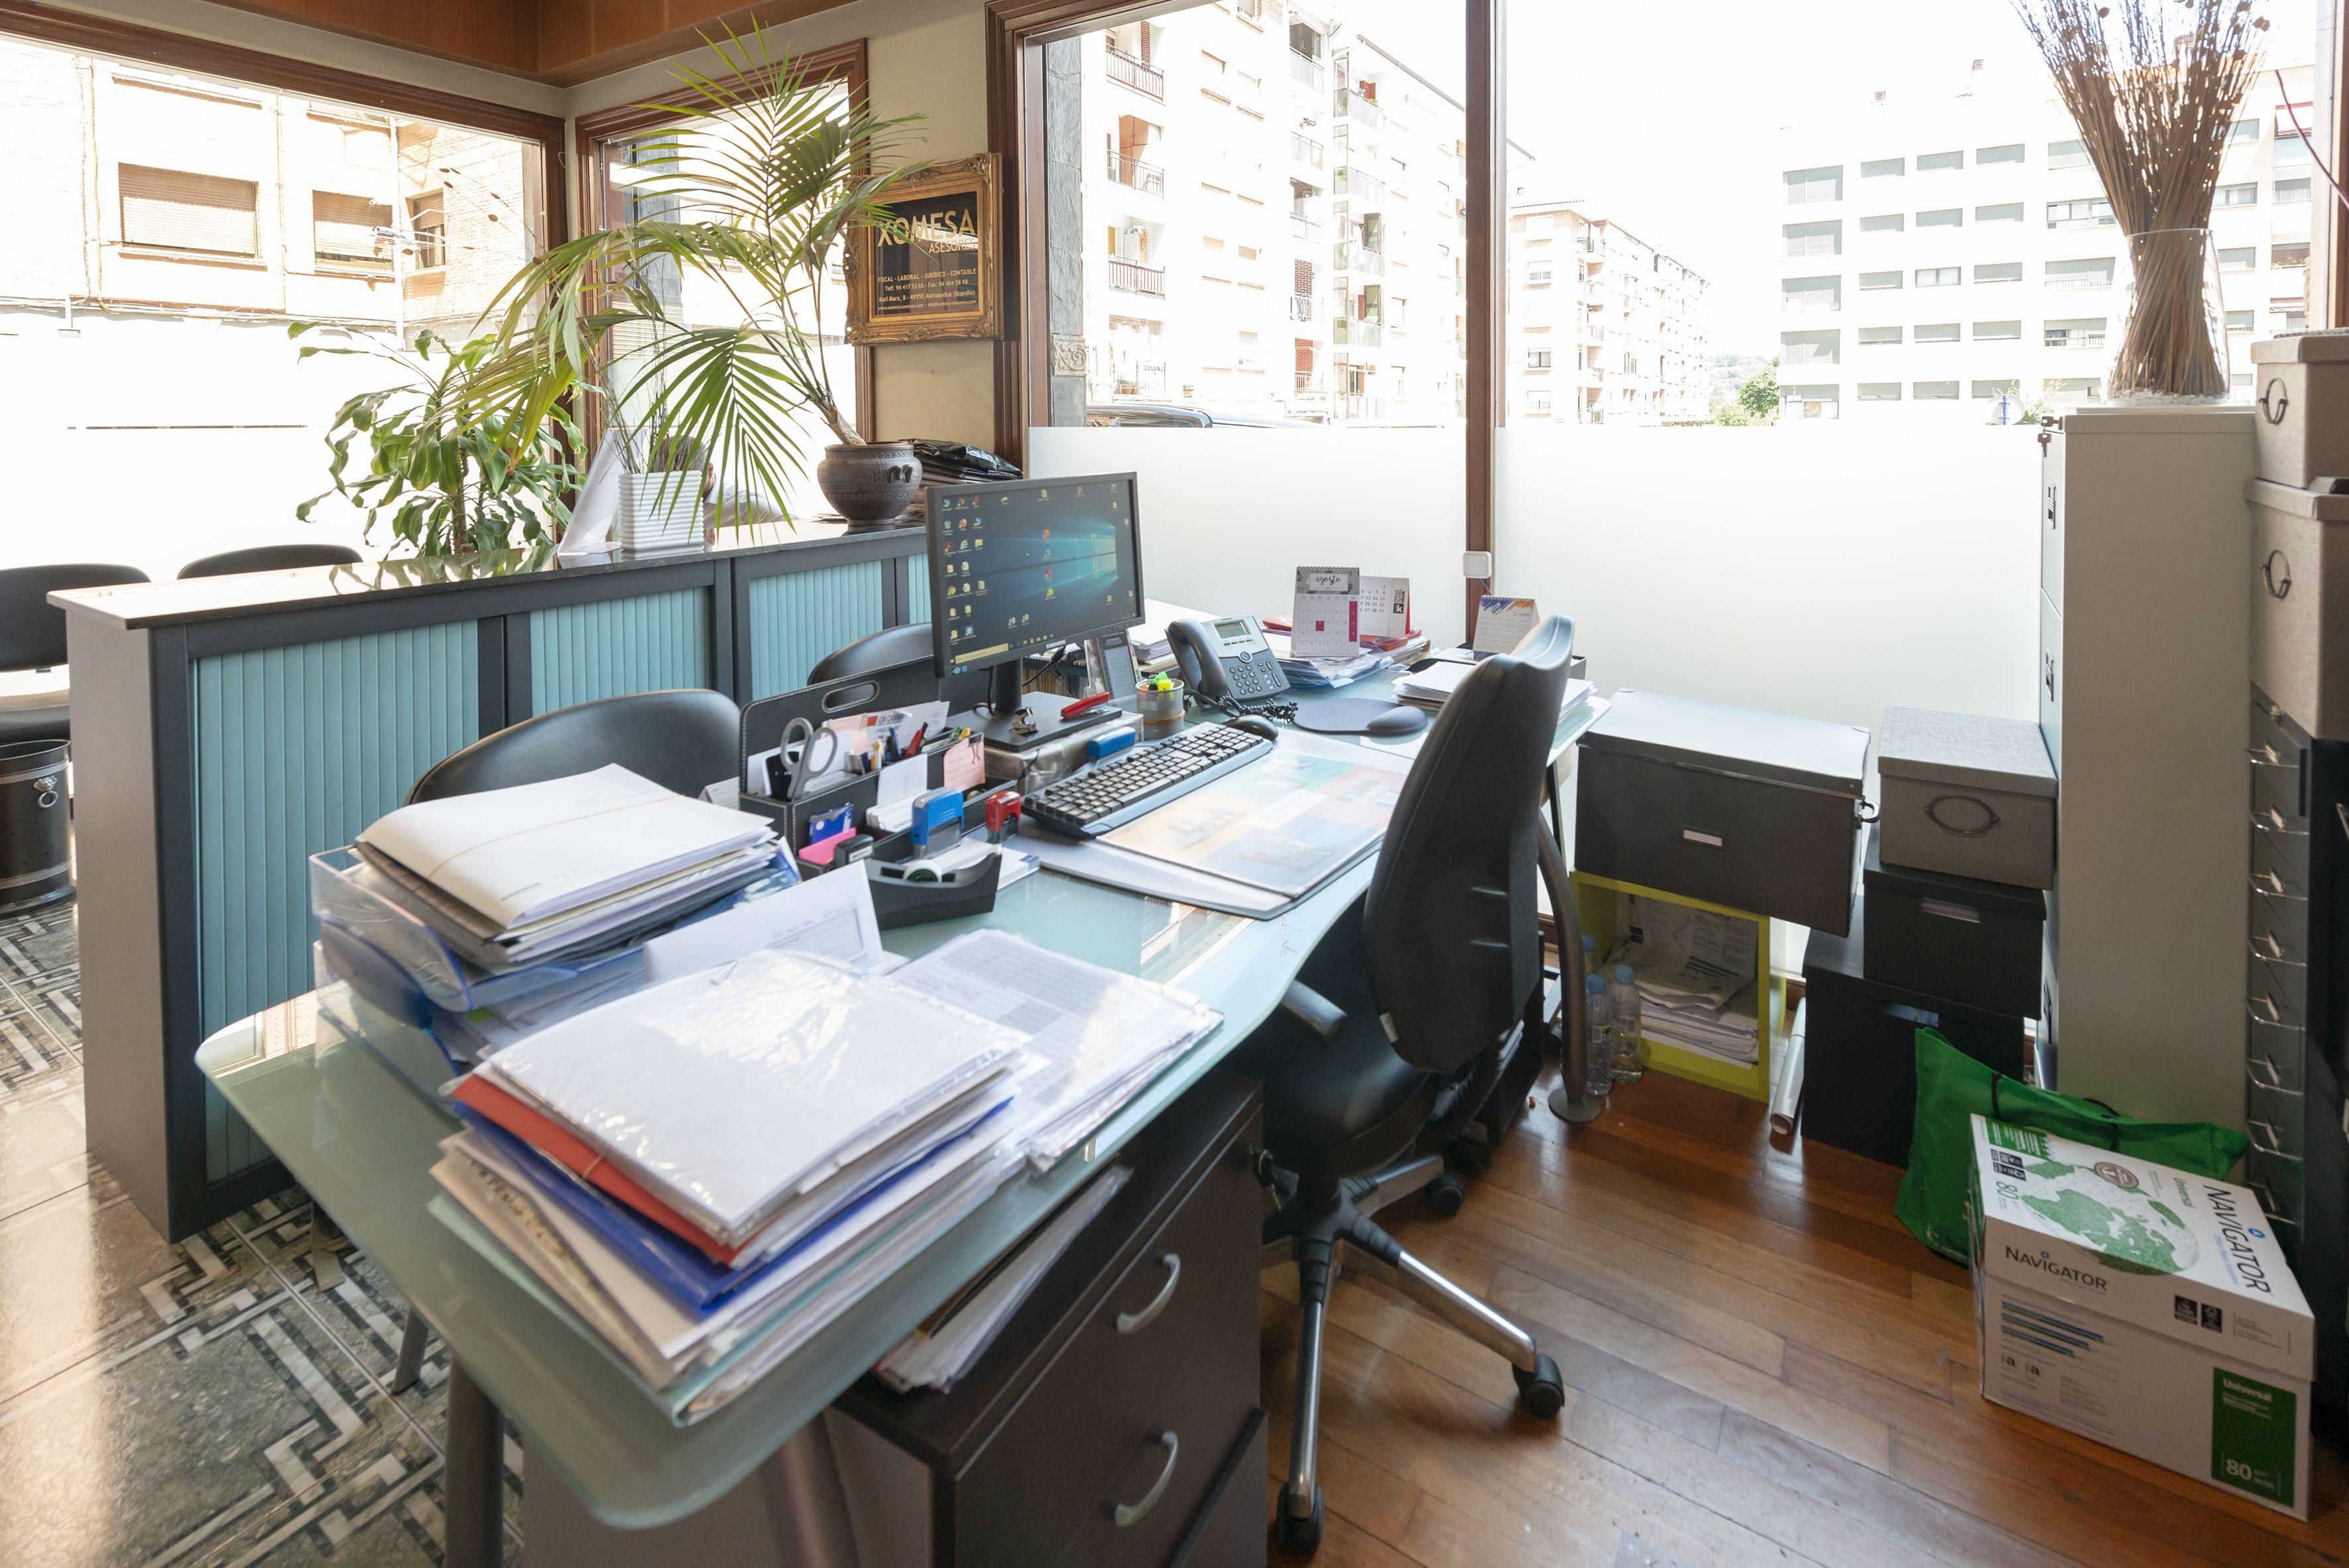 Oficina 2 XOMESA ASESORES, S.L.